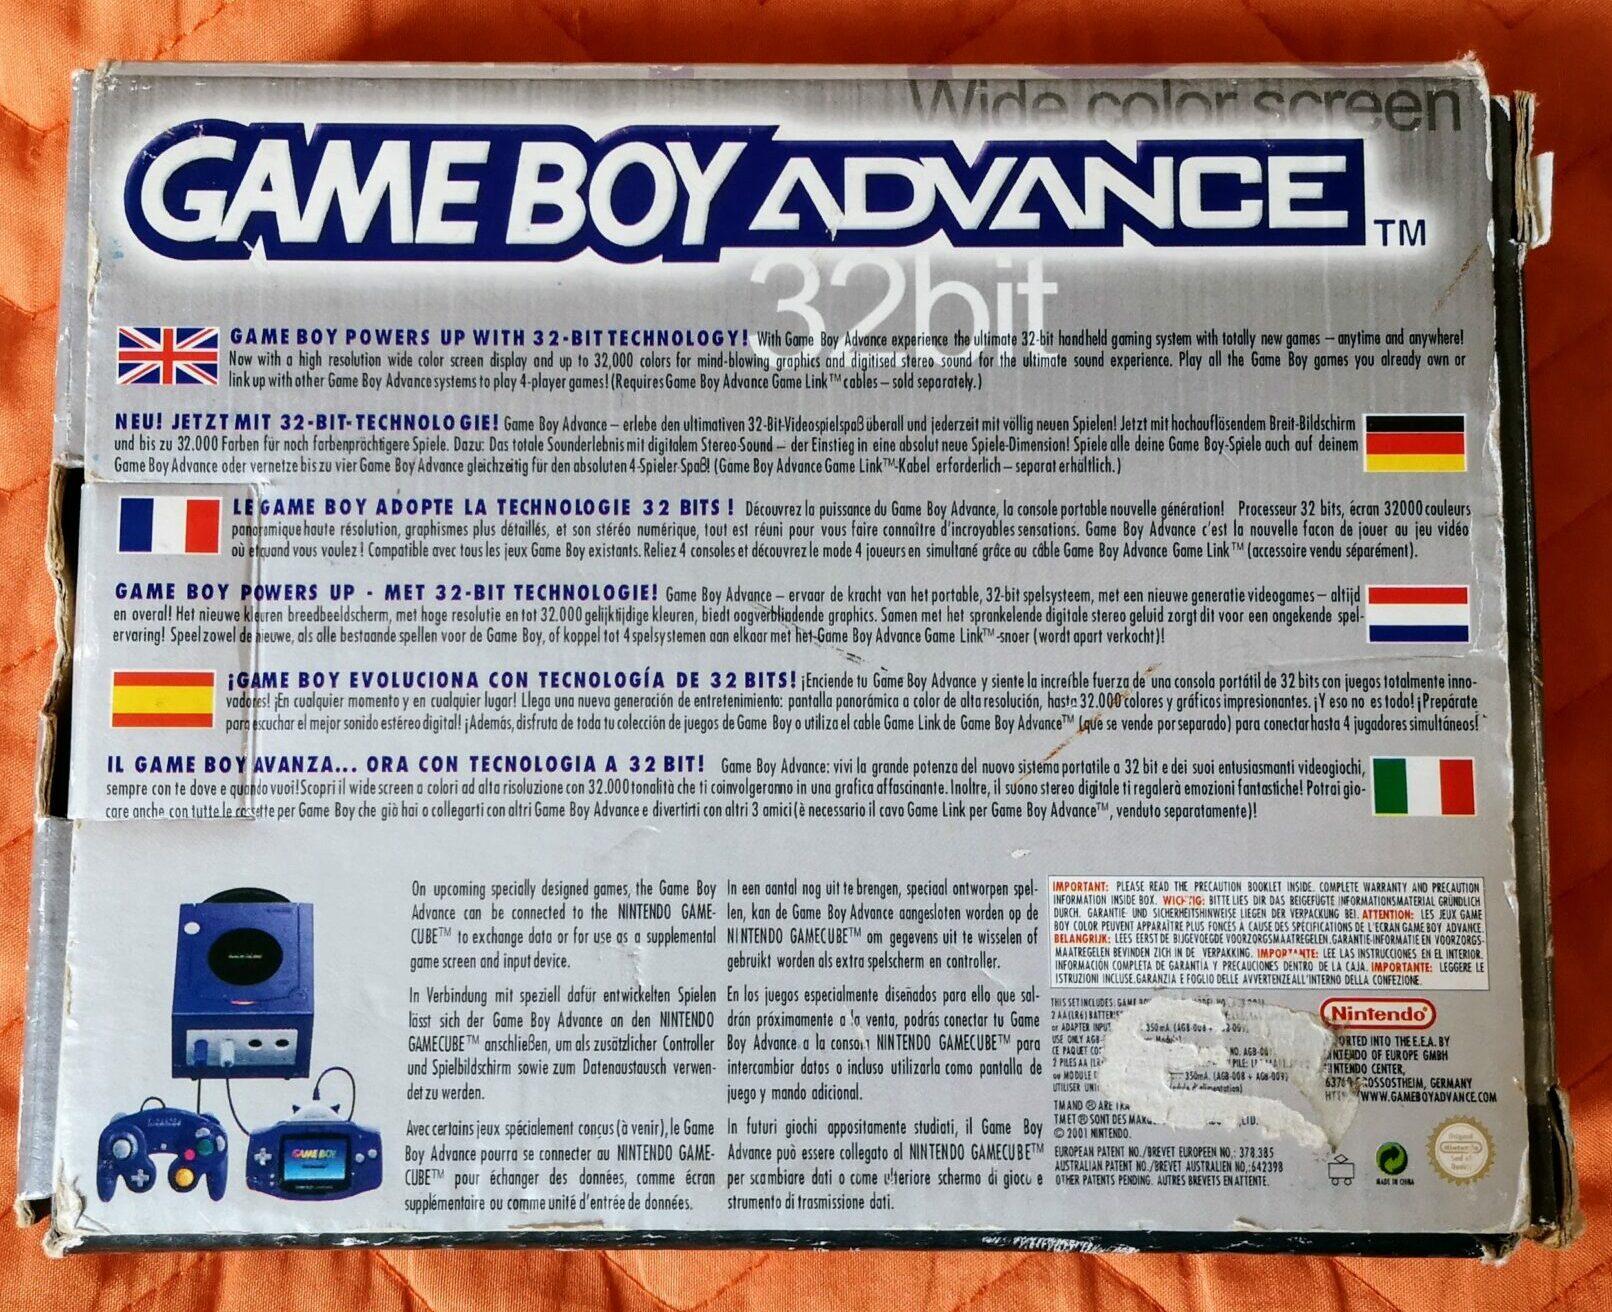 Game Boy Advance, scatola retro